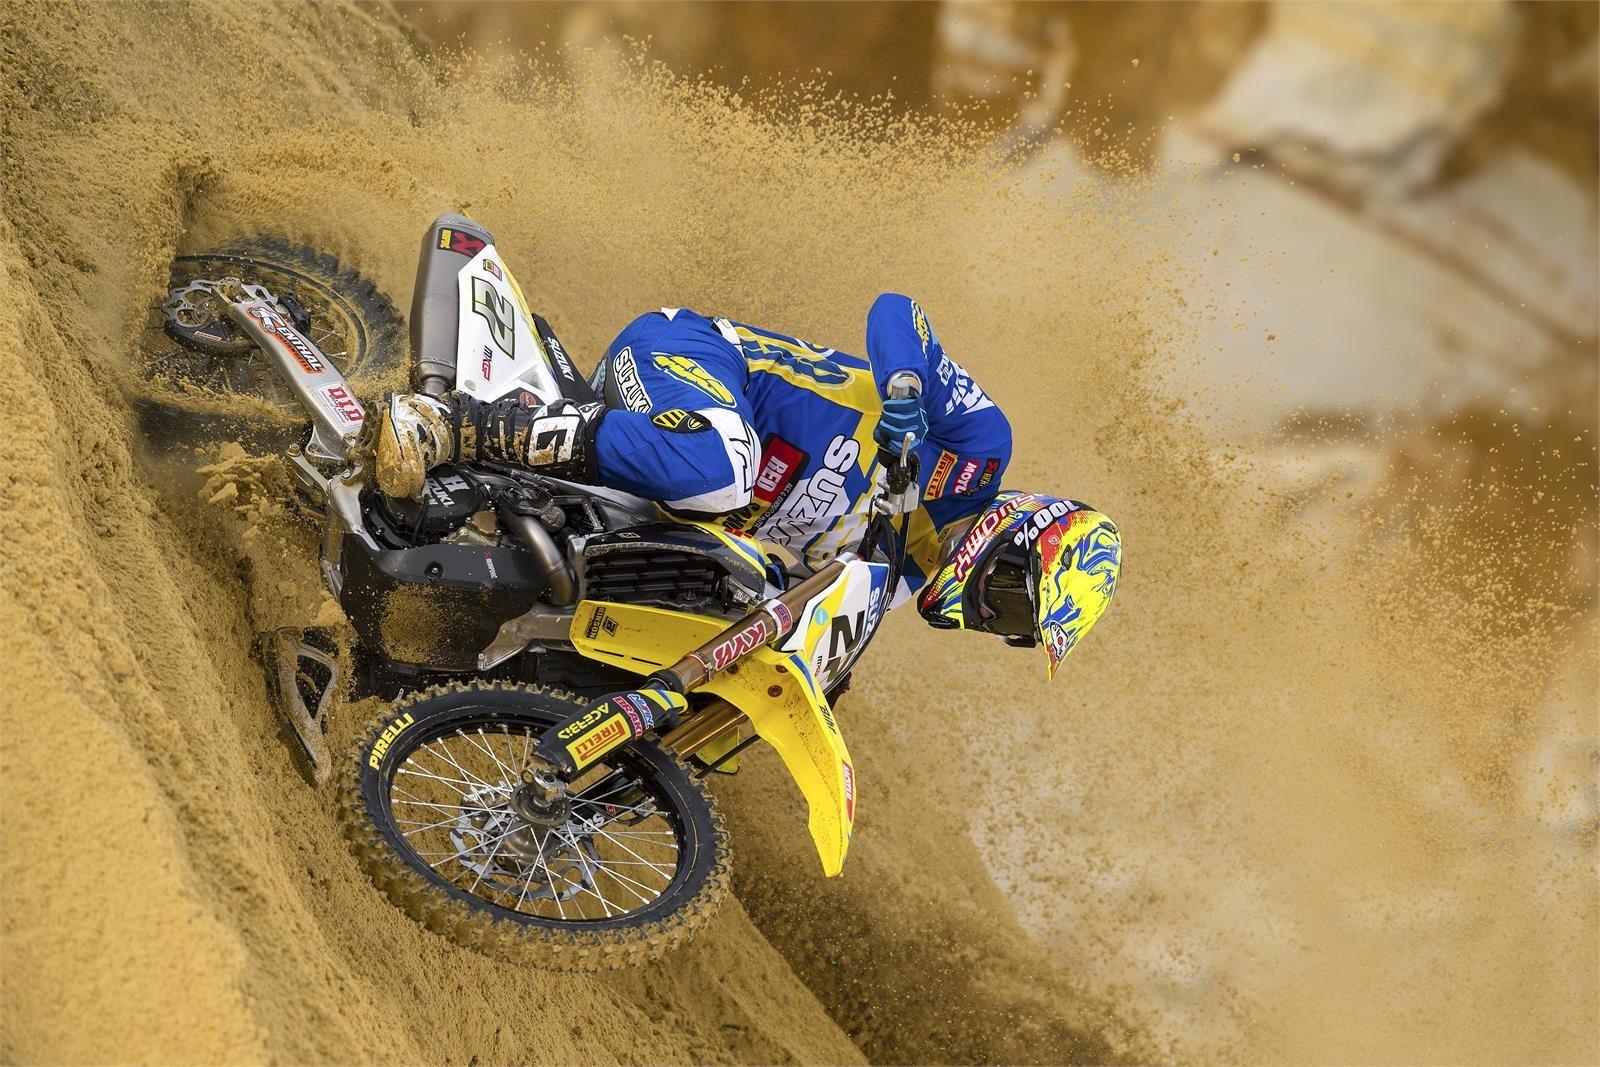 Arminas Jasikonis - First Look: 2017 Suzuki World MXGP Team - Motocross Pictures - Vital MX